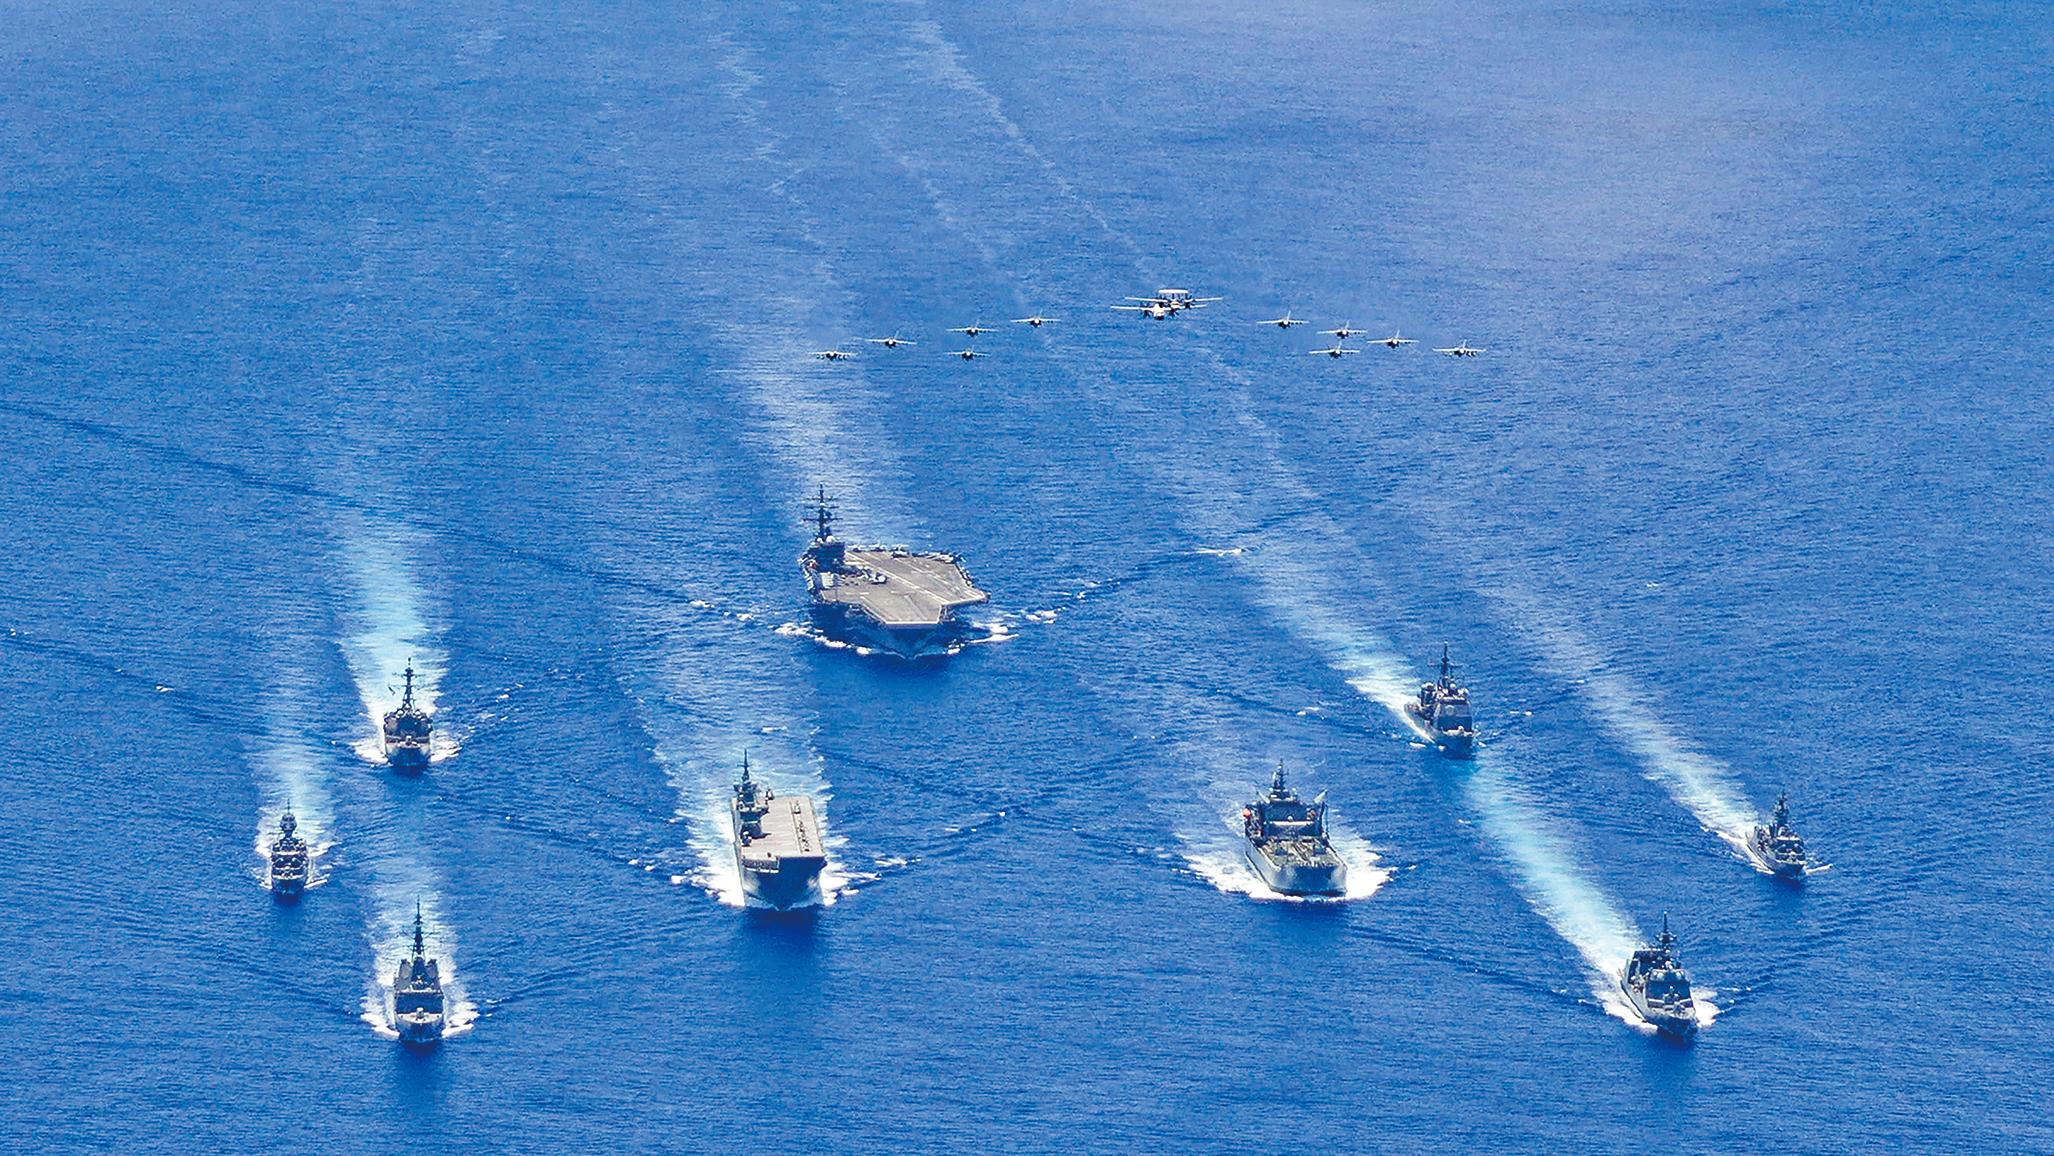 p2020年7月21日,美國里根航母(CVN 76)打擊群與澳大利亞和日本海軍在南海進行聯合協同巡弋。(U.S. Navy photo)